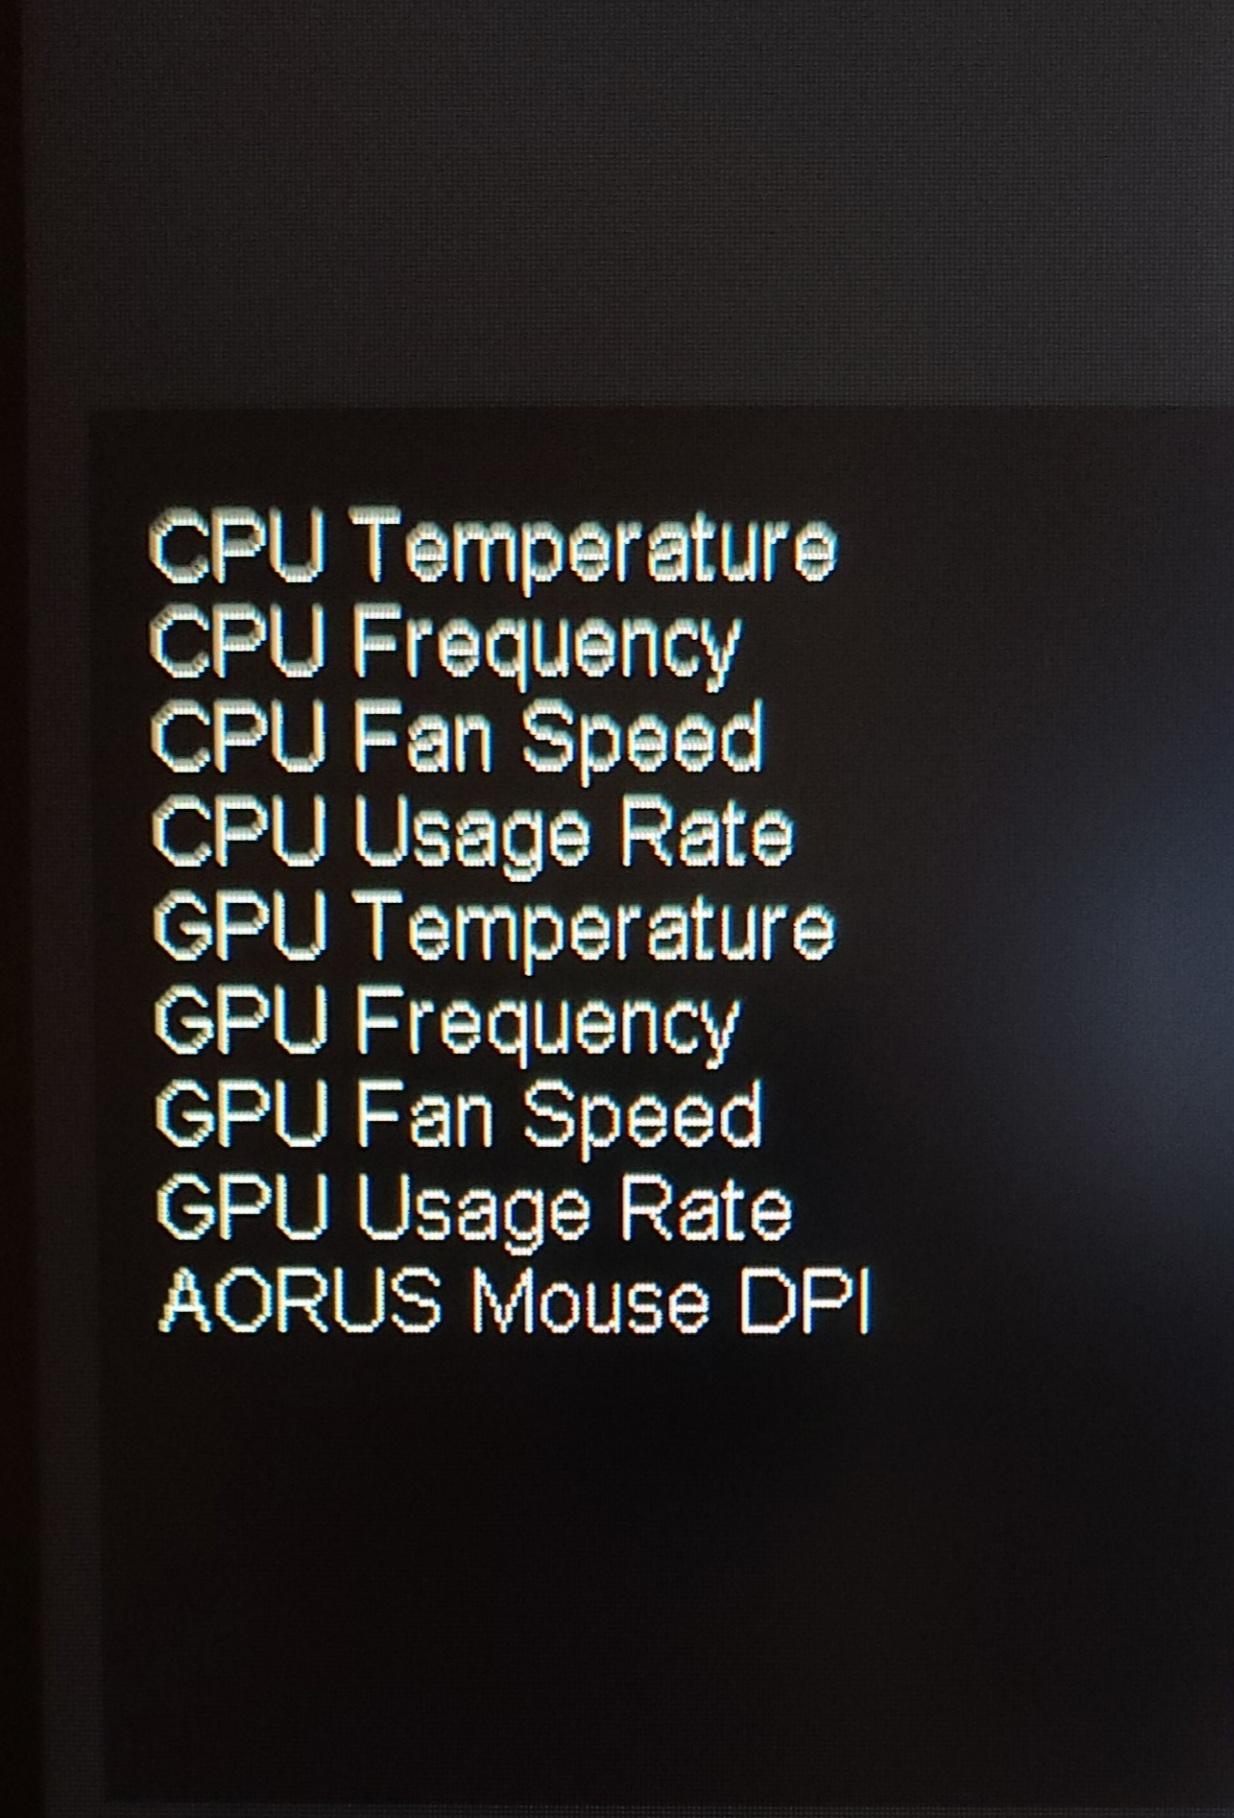 PC Overlay c74283c3-ece3-4c86-bff0-7312cda27301?upload=true.jpg